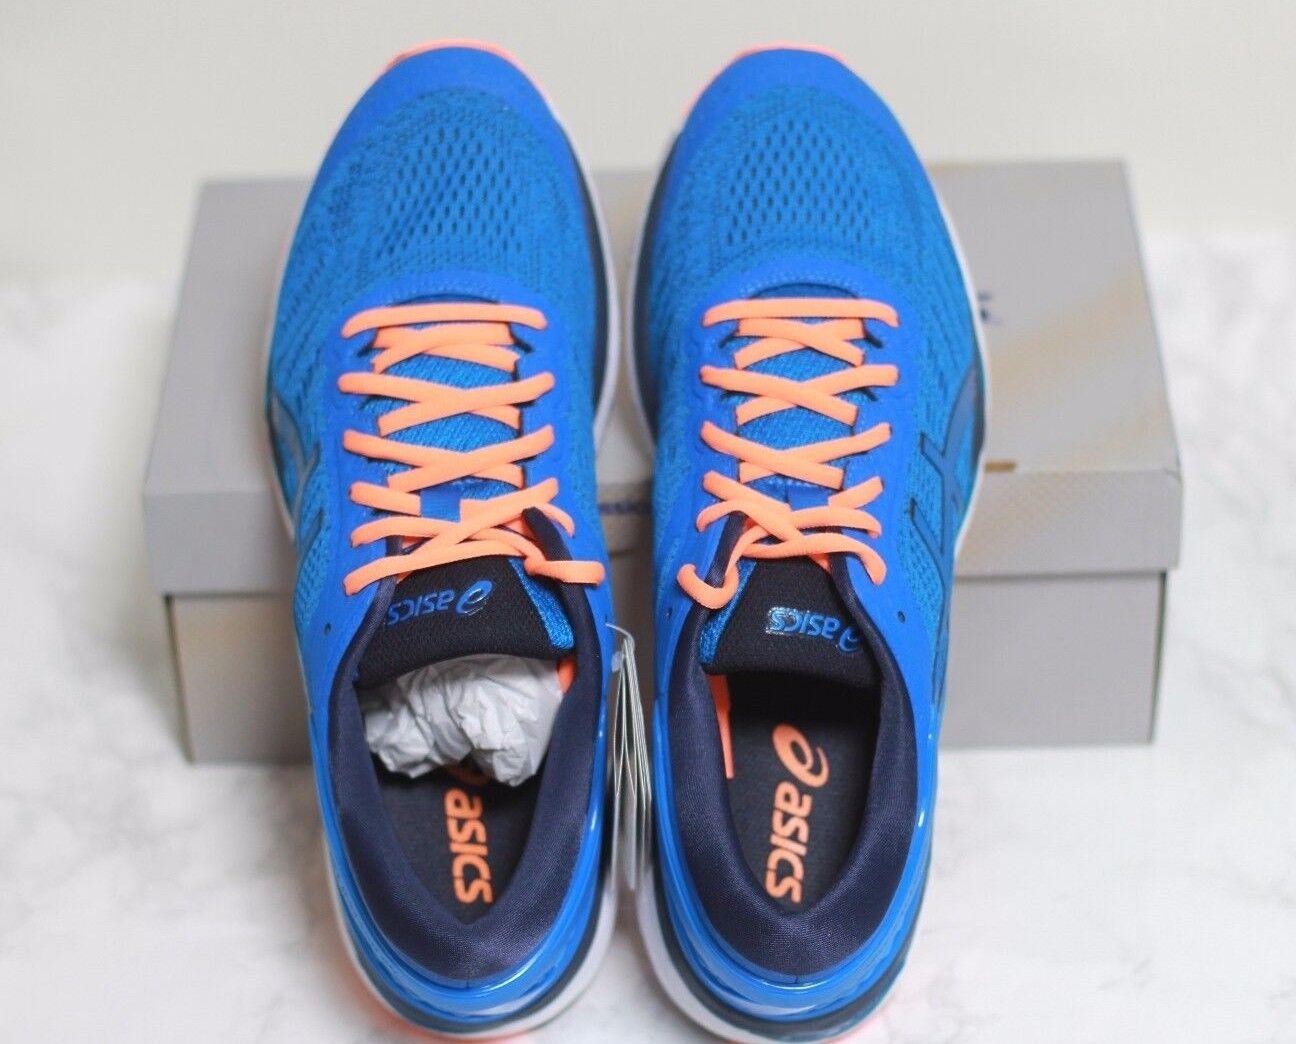 ASICS New Men's GEL KAYANO 24 Road Running shoes DIRECTOIRE DIRECTOIRE DIRECTOIRE bluee Authentic 8eaadb